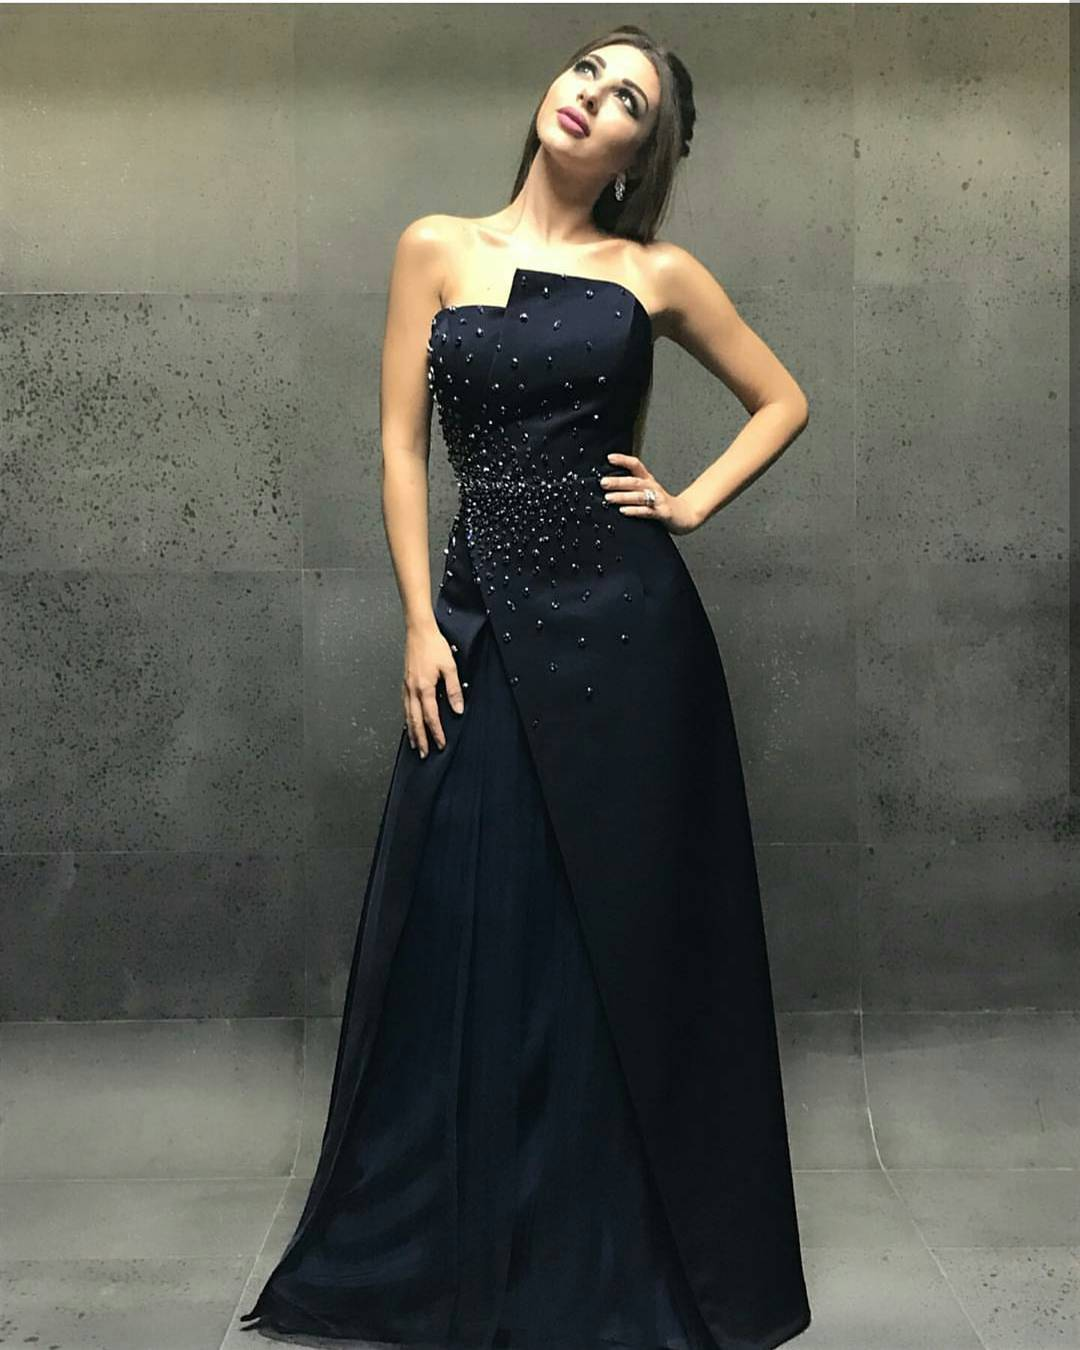 ميريام فارس بفستان أسود